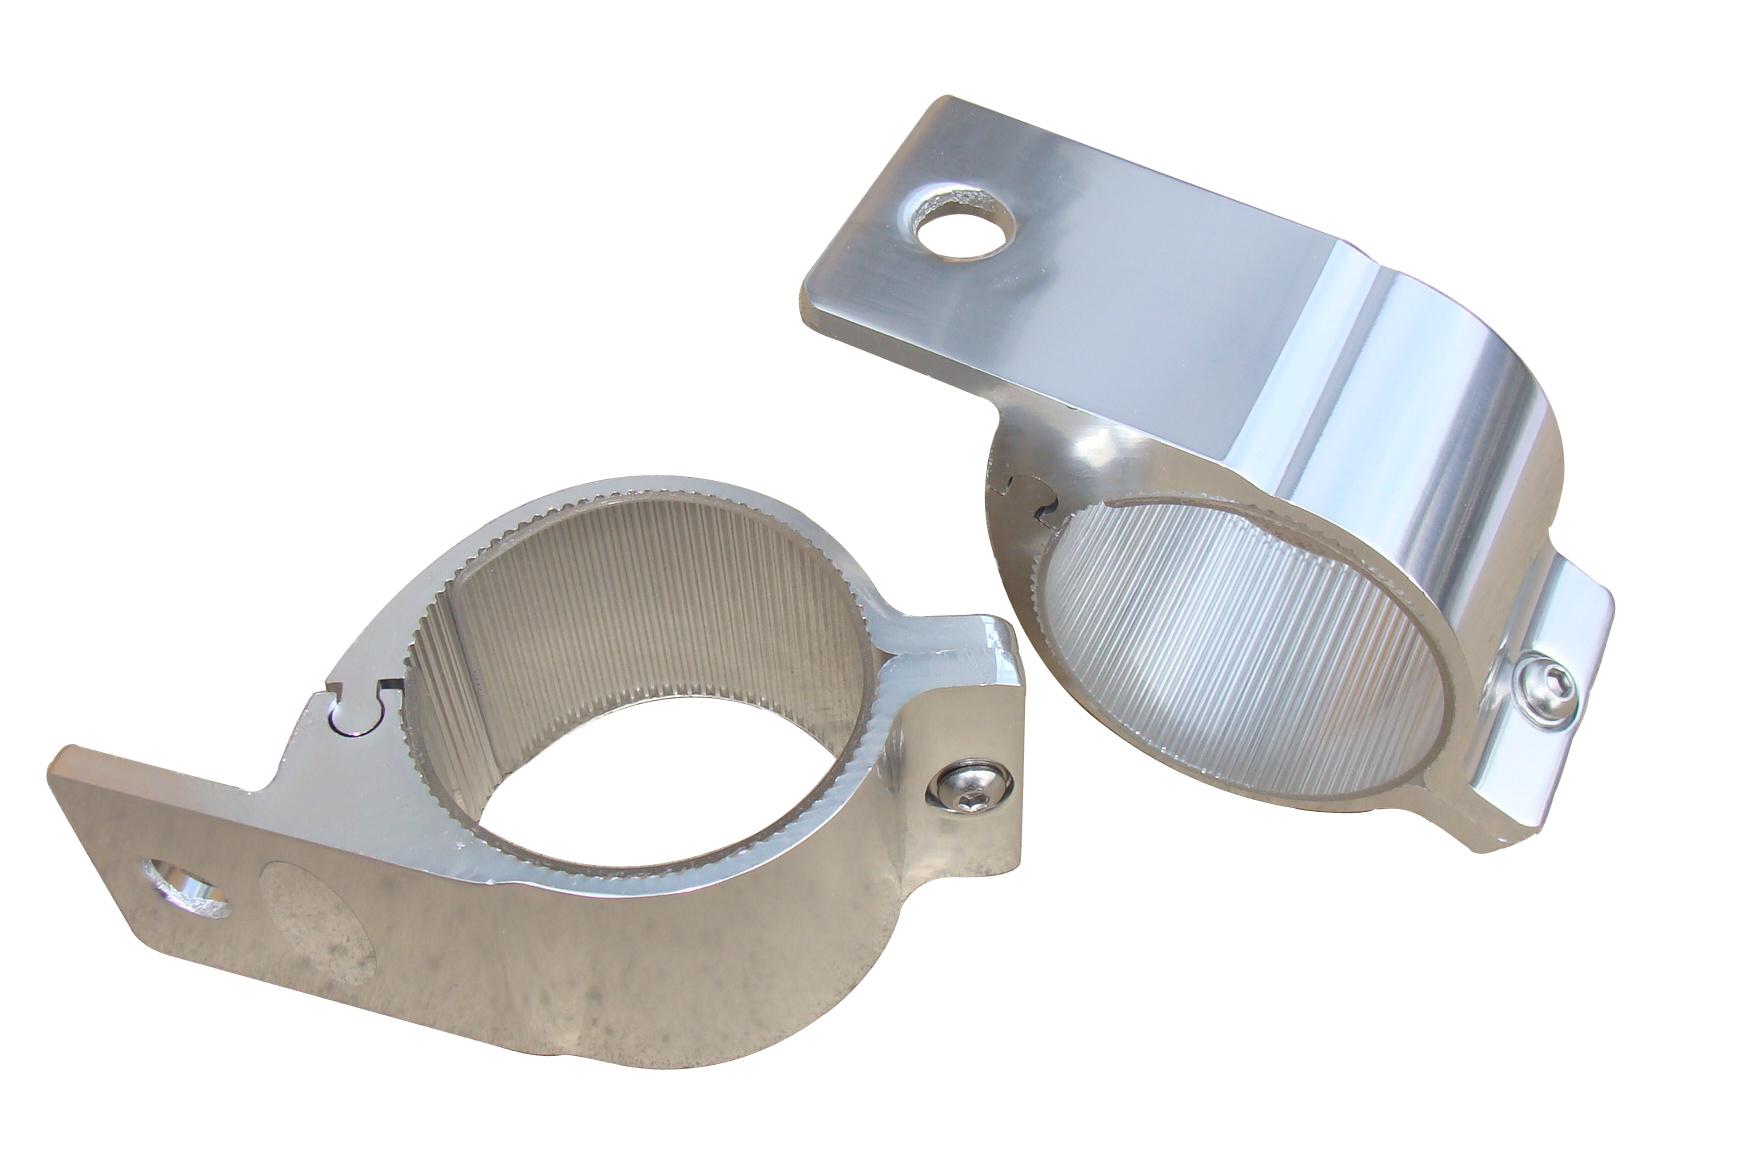 E29 3 0 Quot Spot Light Bar Clamp Bracket Silver 3 Quot 76mm Large